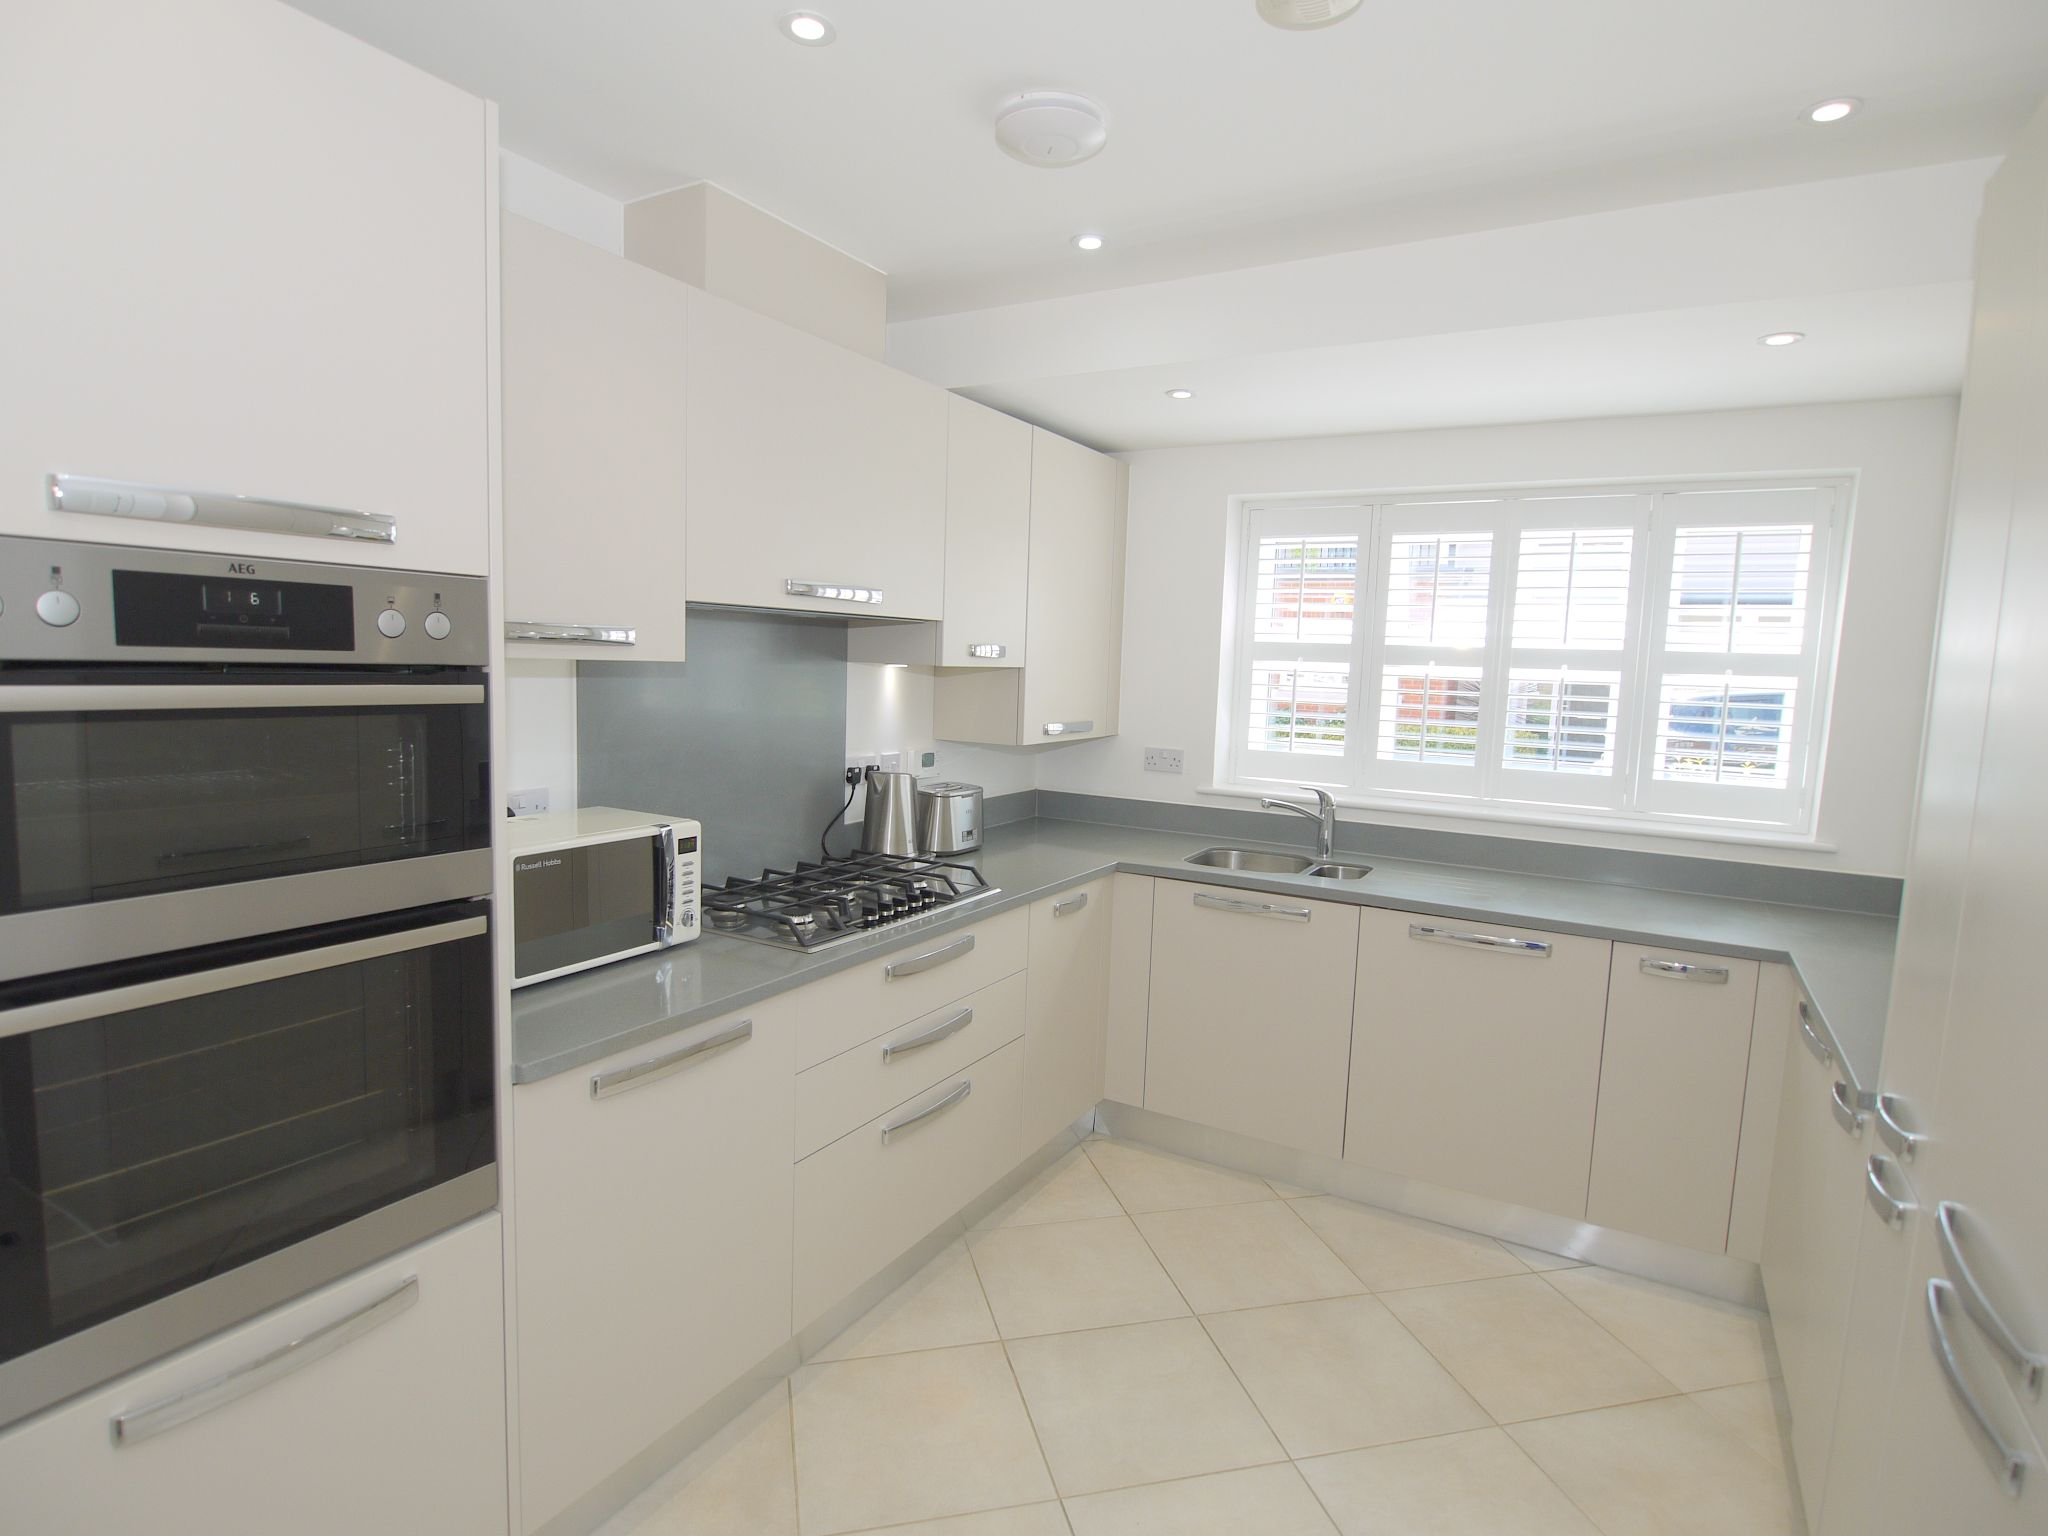 5 bedroom semi-detached house For Sale in Tonbridge - Photograph 3